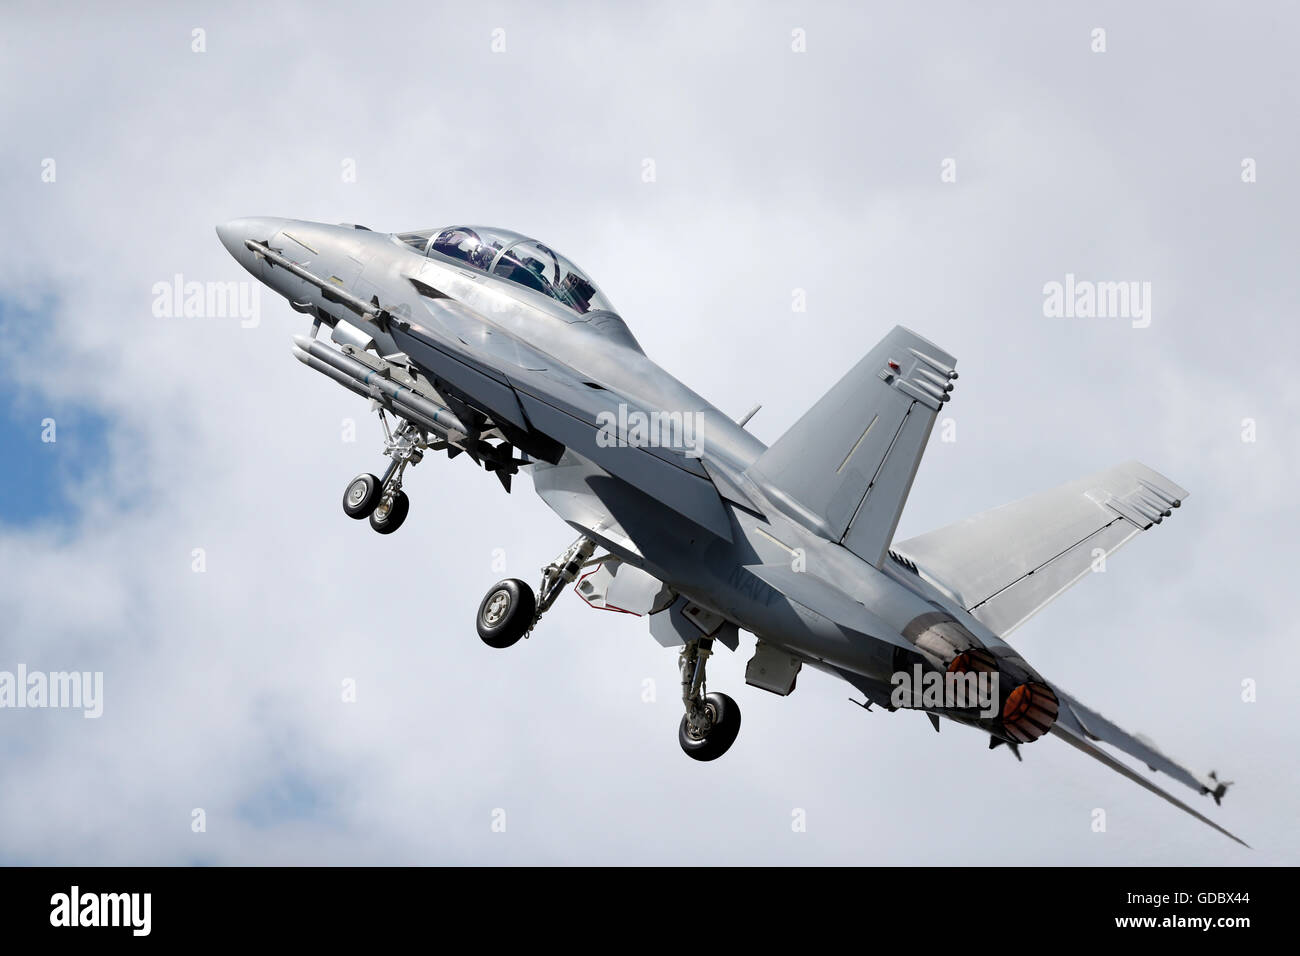 F/A-18E/F Super Hornet flies during The Farnborough International Airshow July 2016 Stock Photo